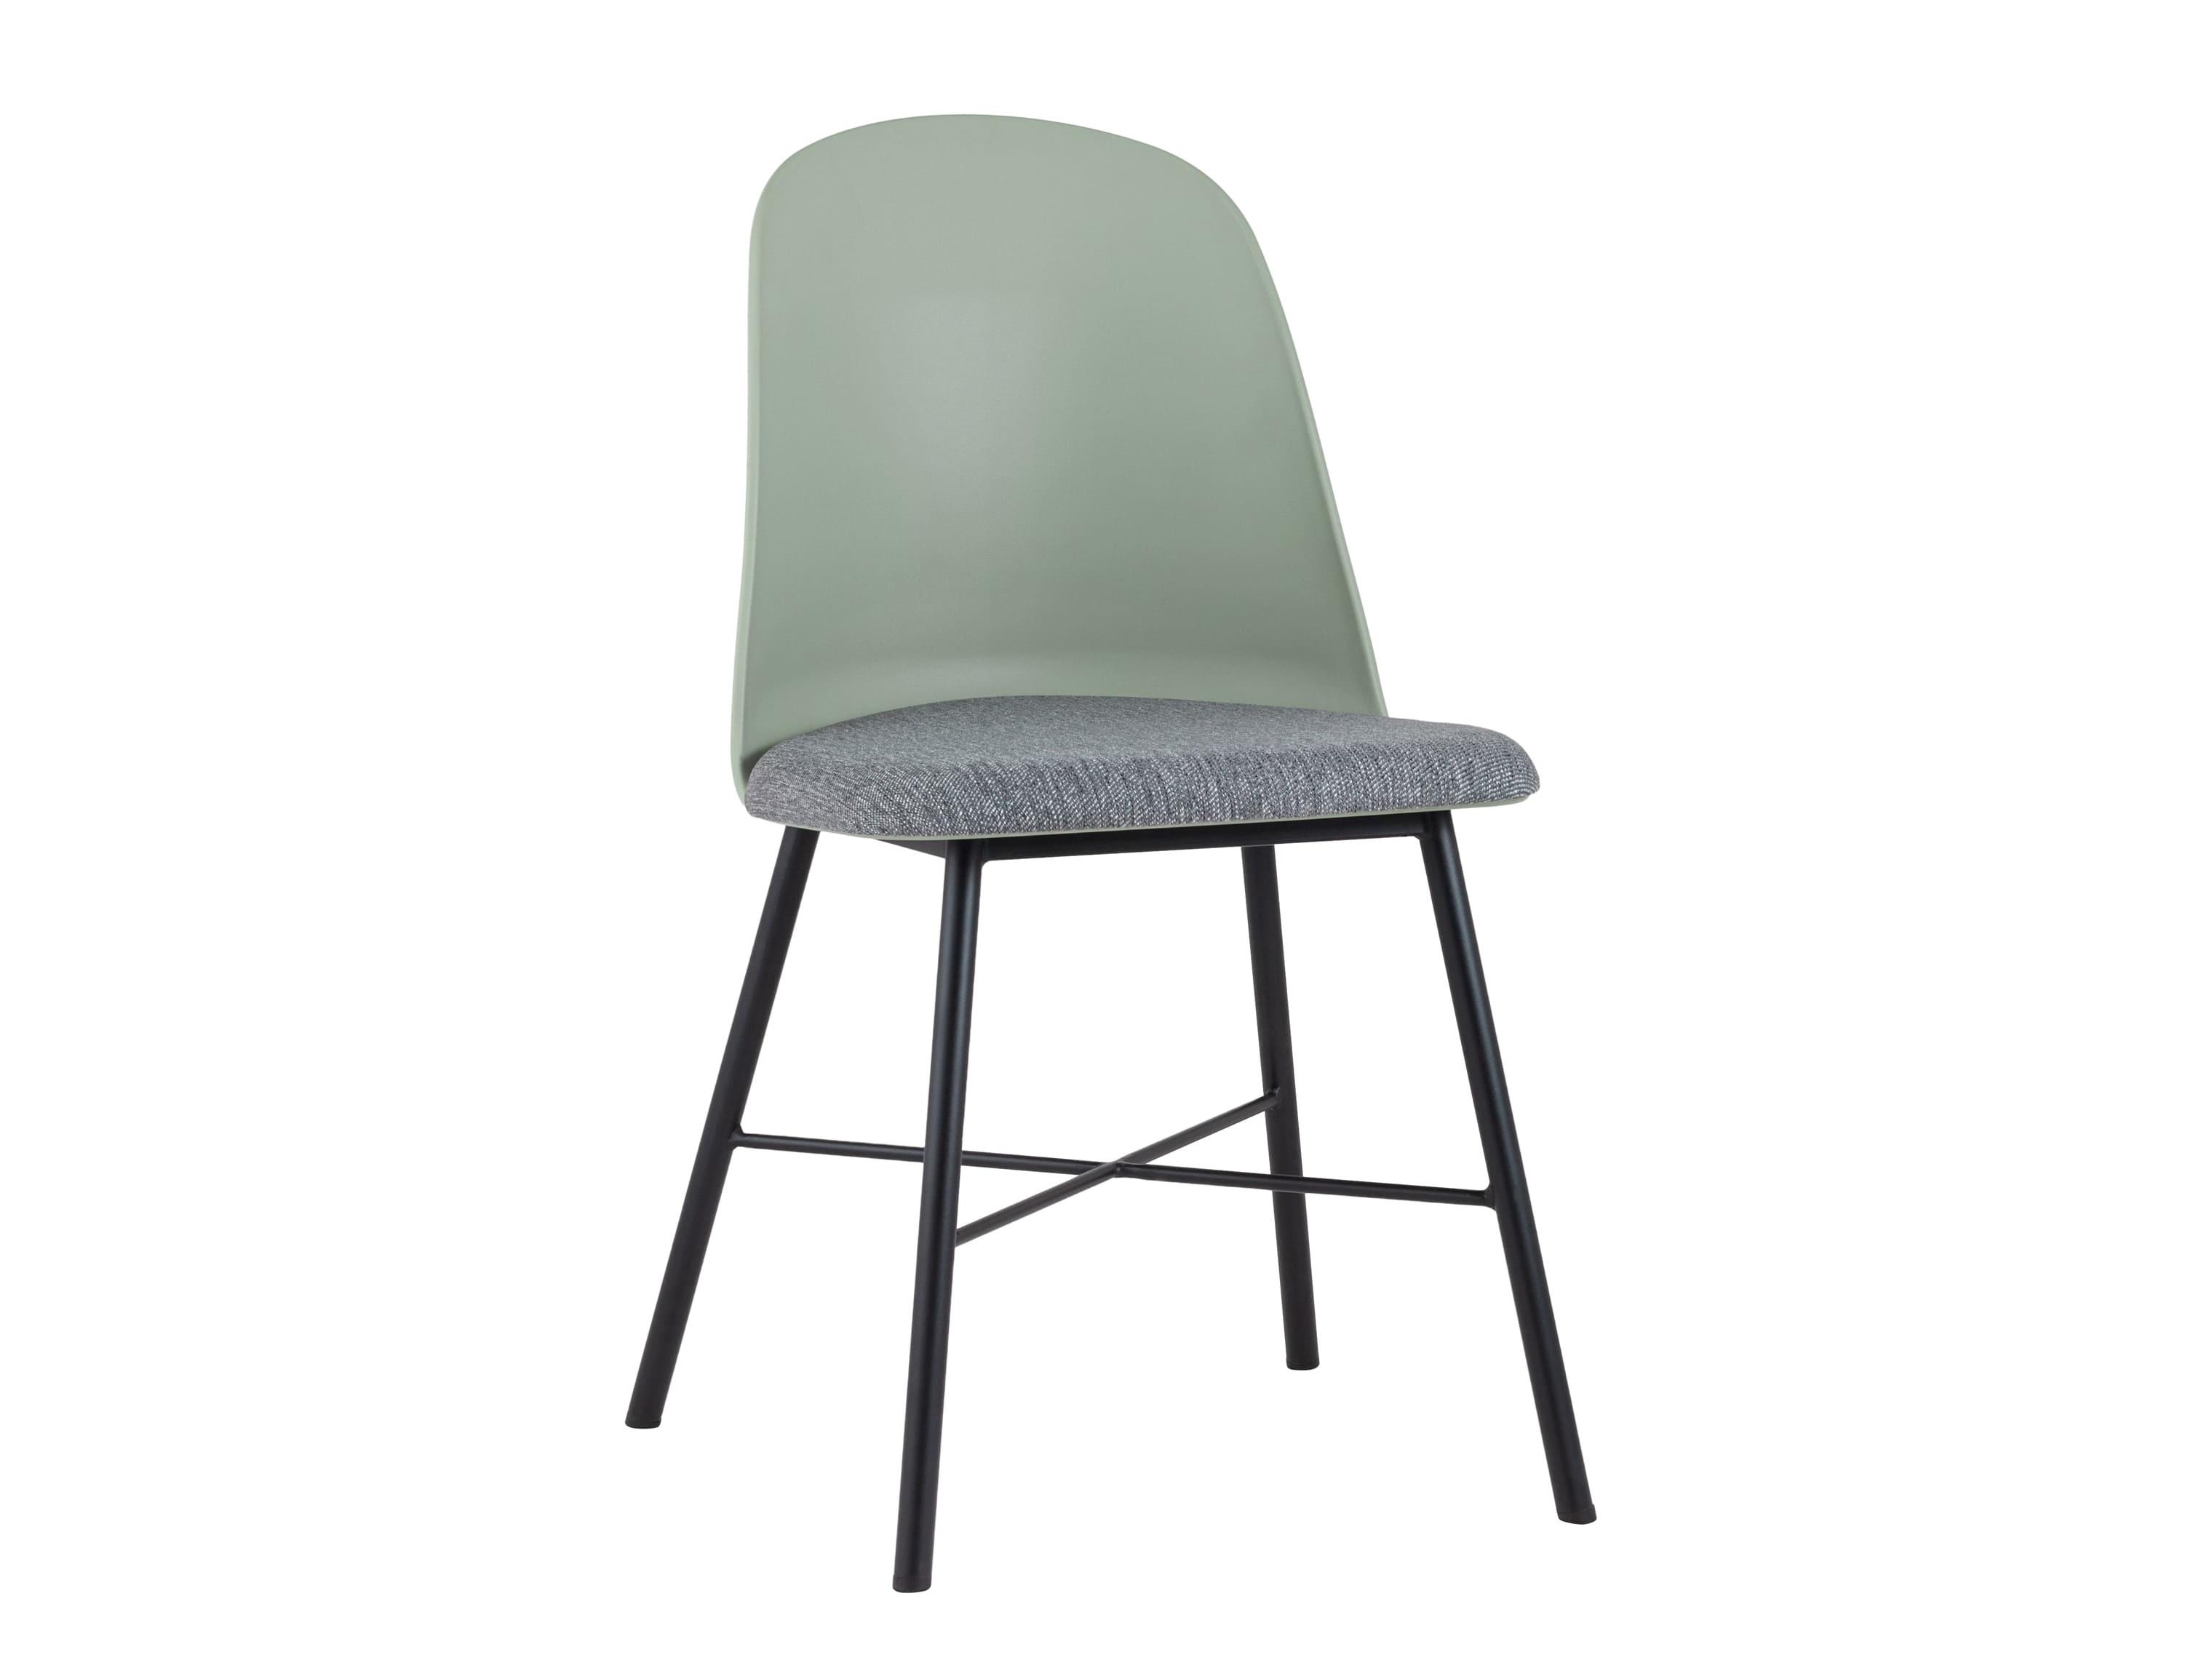 Стул shell (stool group) зеленый 50x83x52 см.